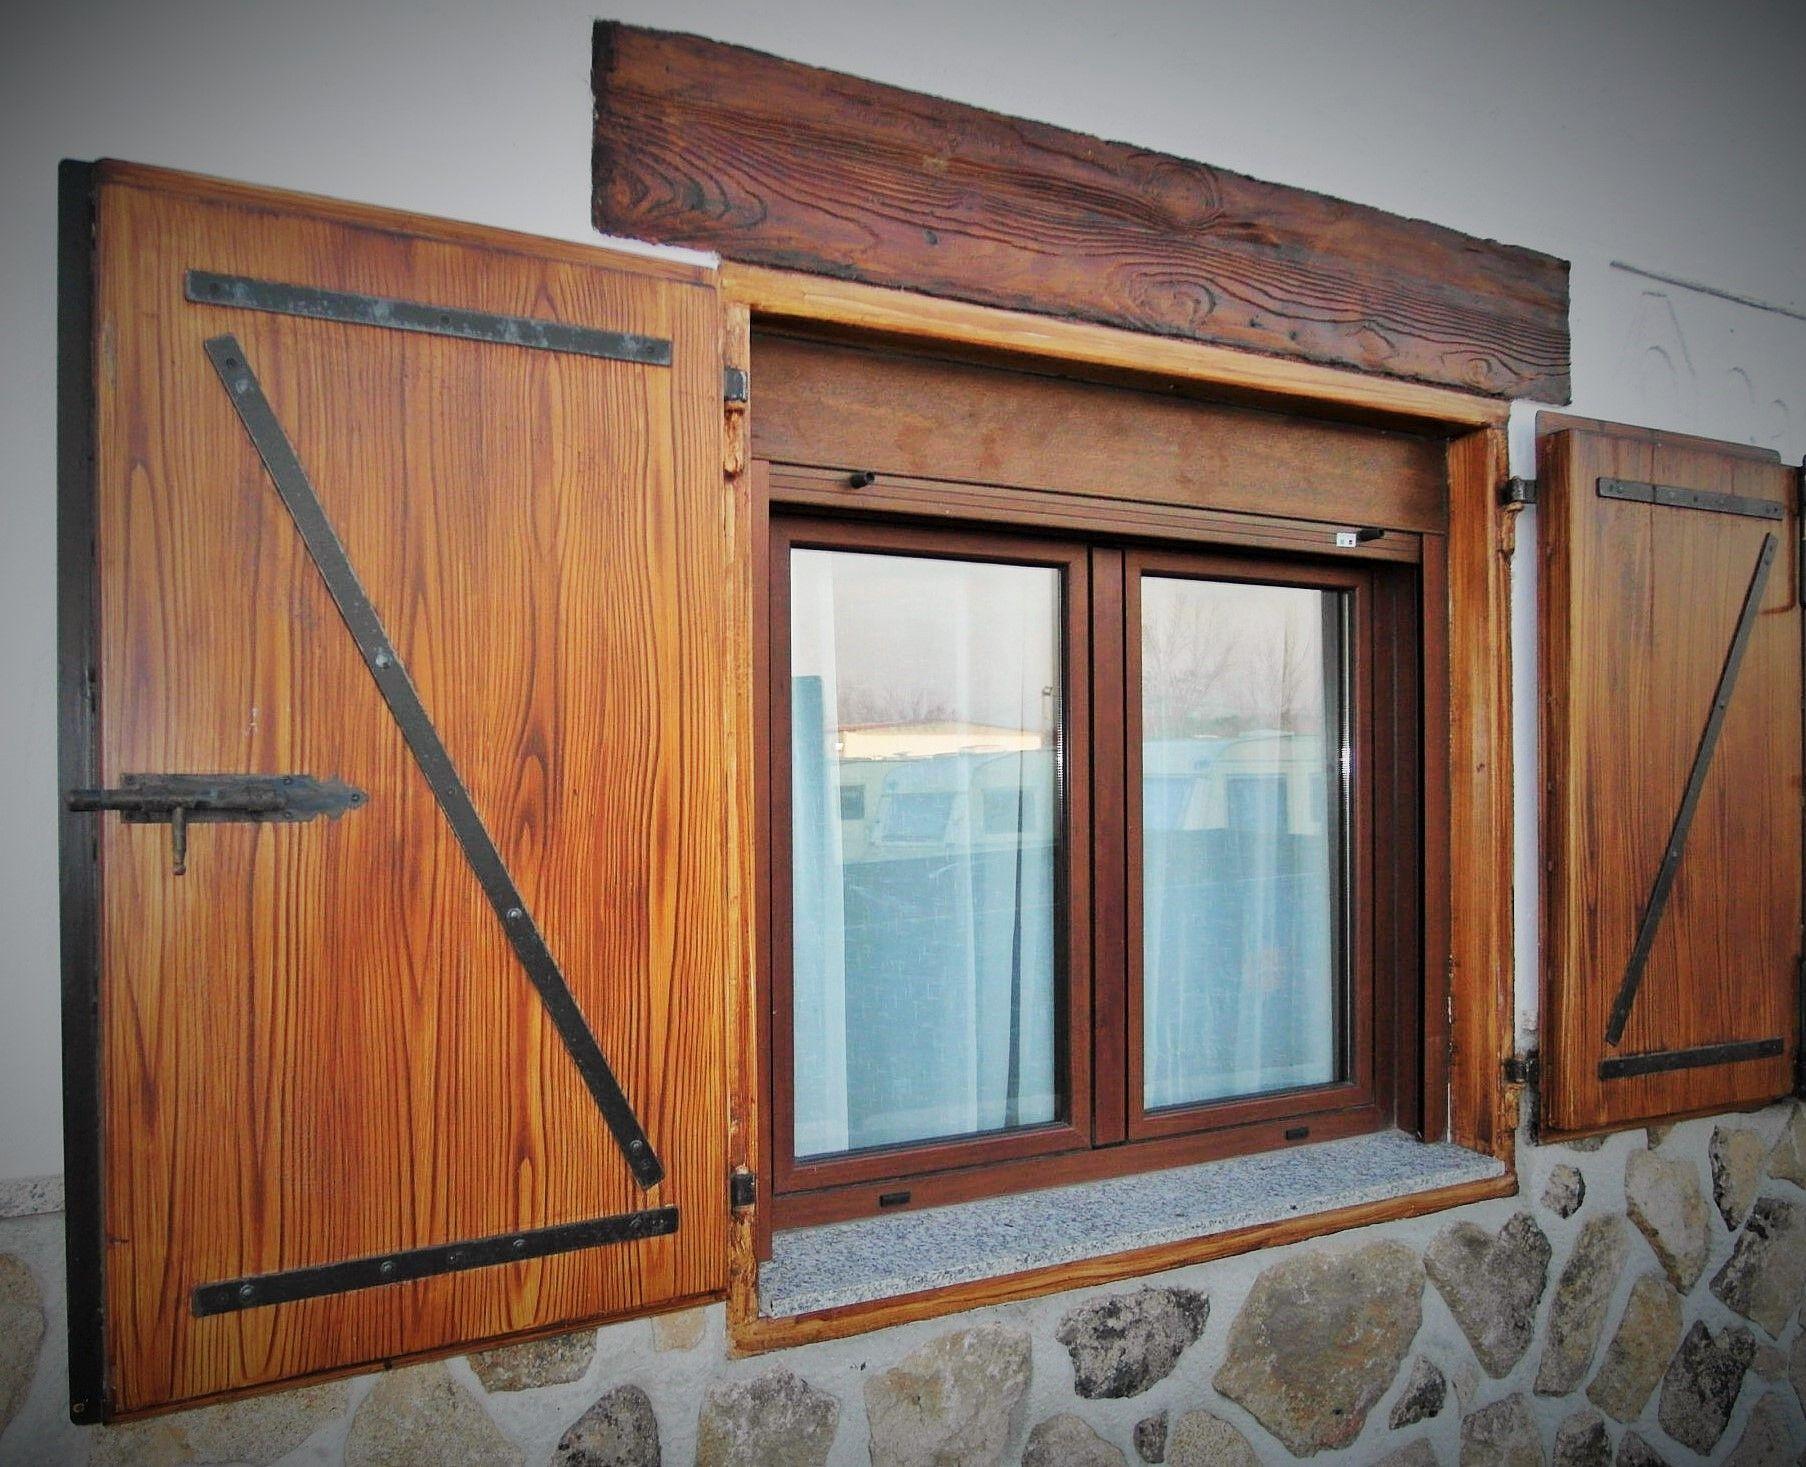 Contraventana de acero imitando madera www - Casas de acero prefabricadas ...